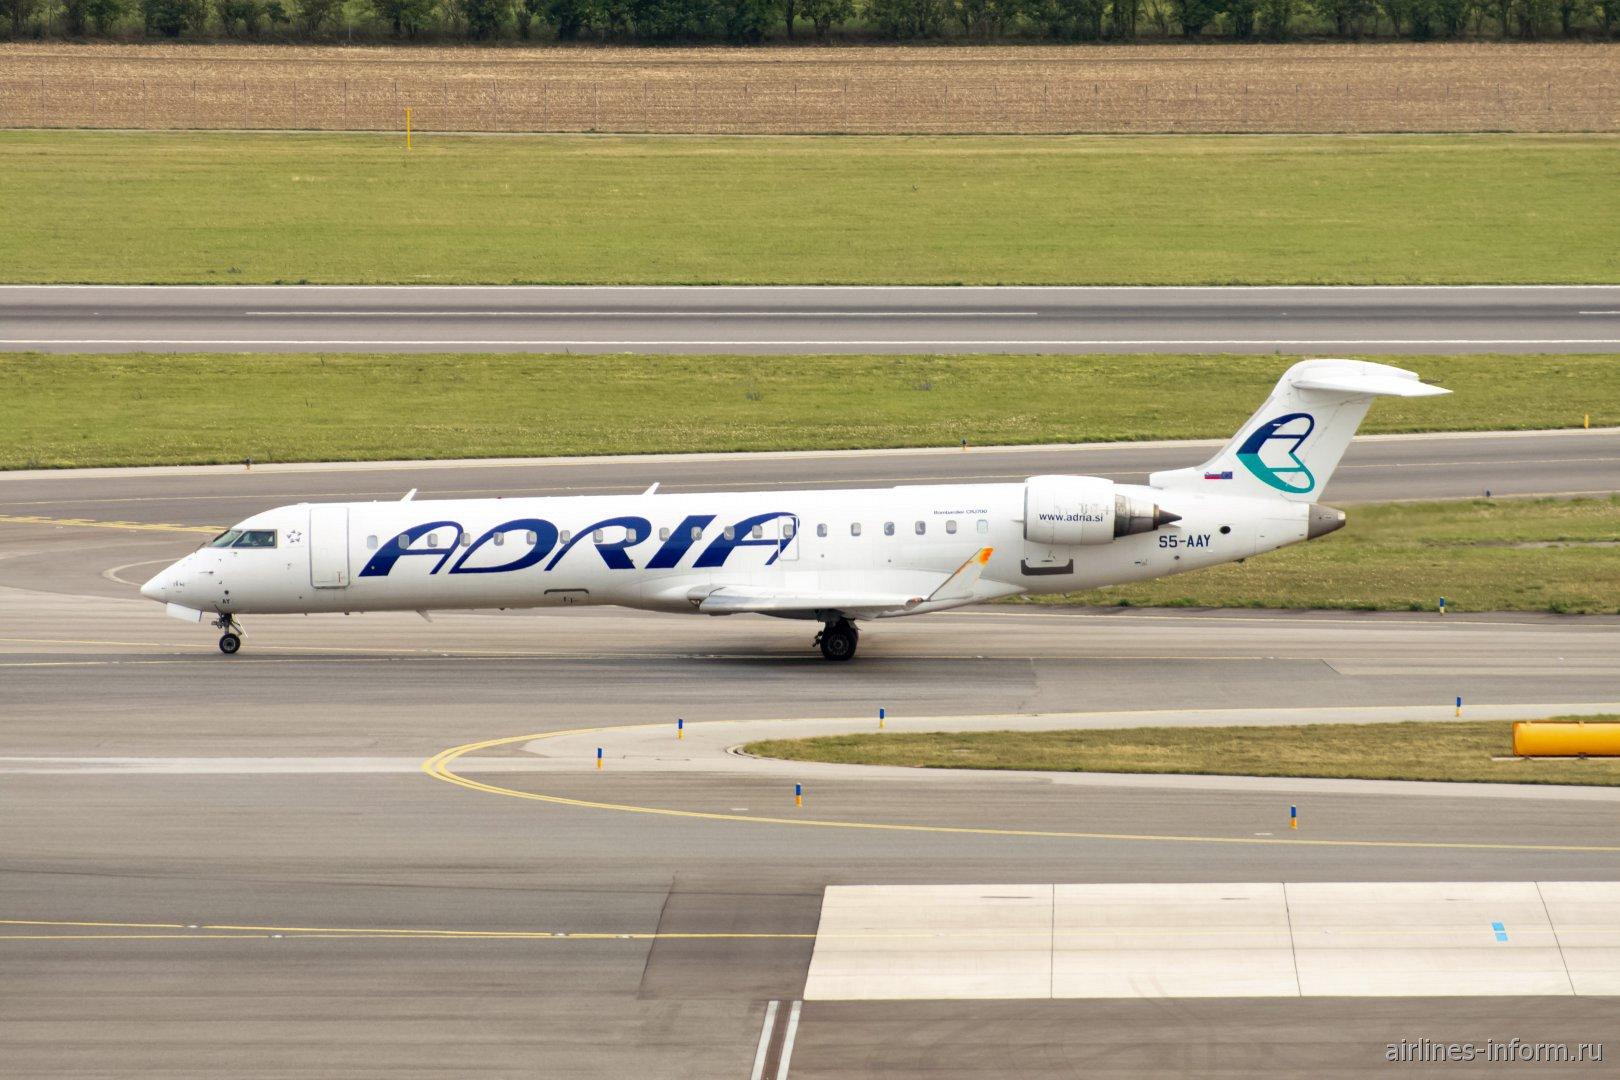 Самолет Bombardier CRJ-700 S5-AAY авиакомпании Adria в аэропорту Вены